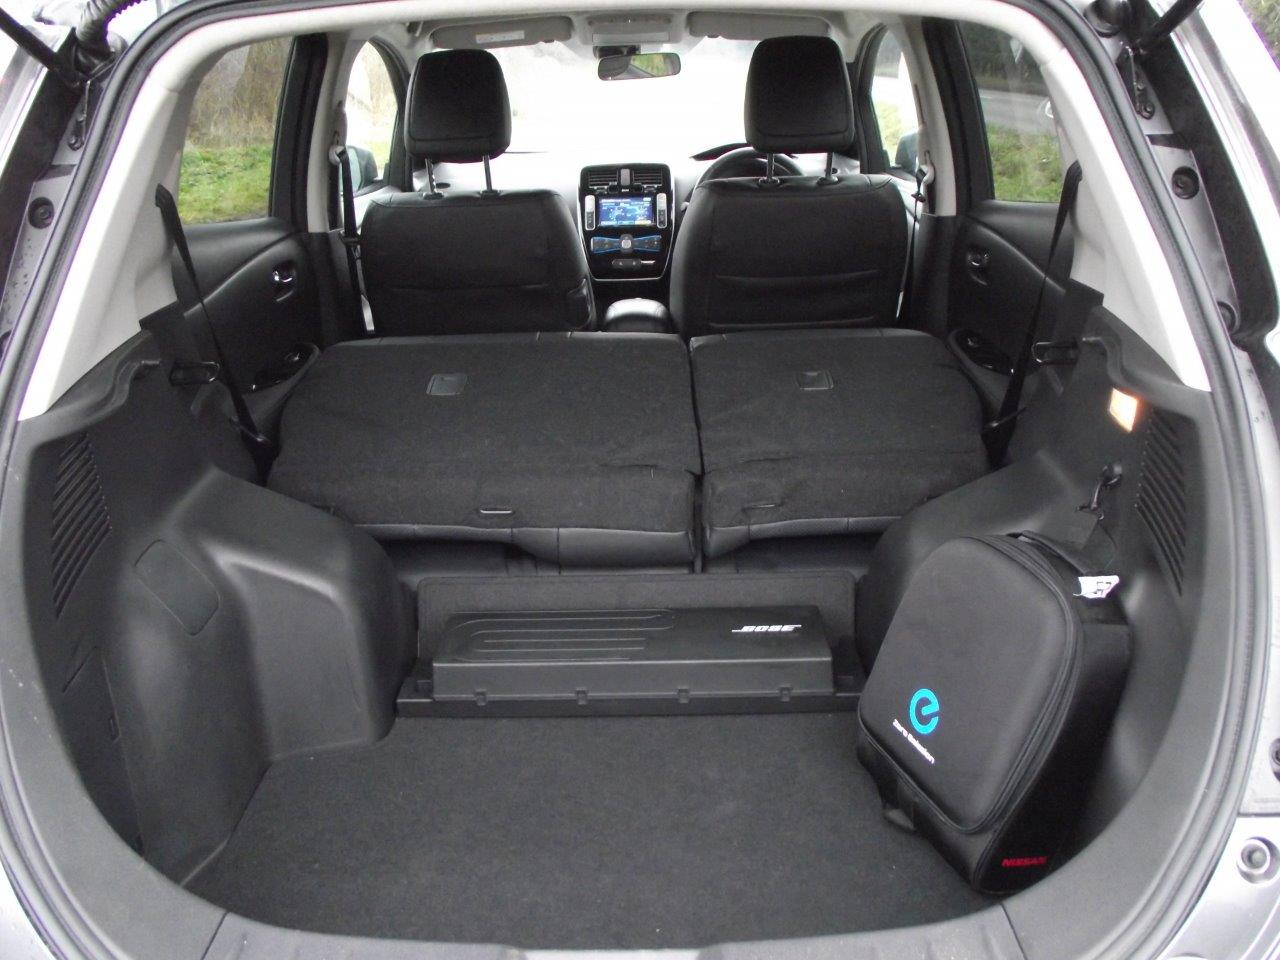 Nissan Leaf seat layout